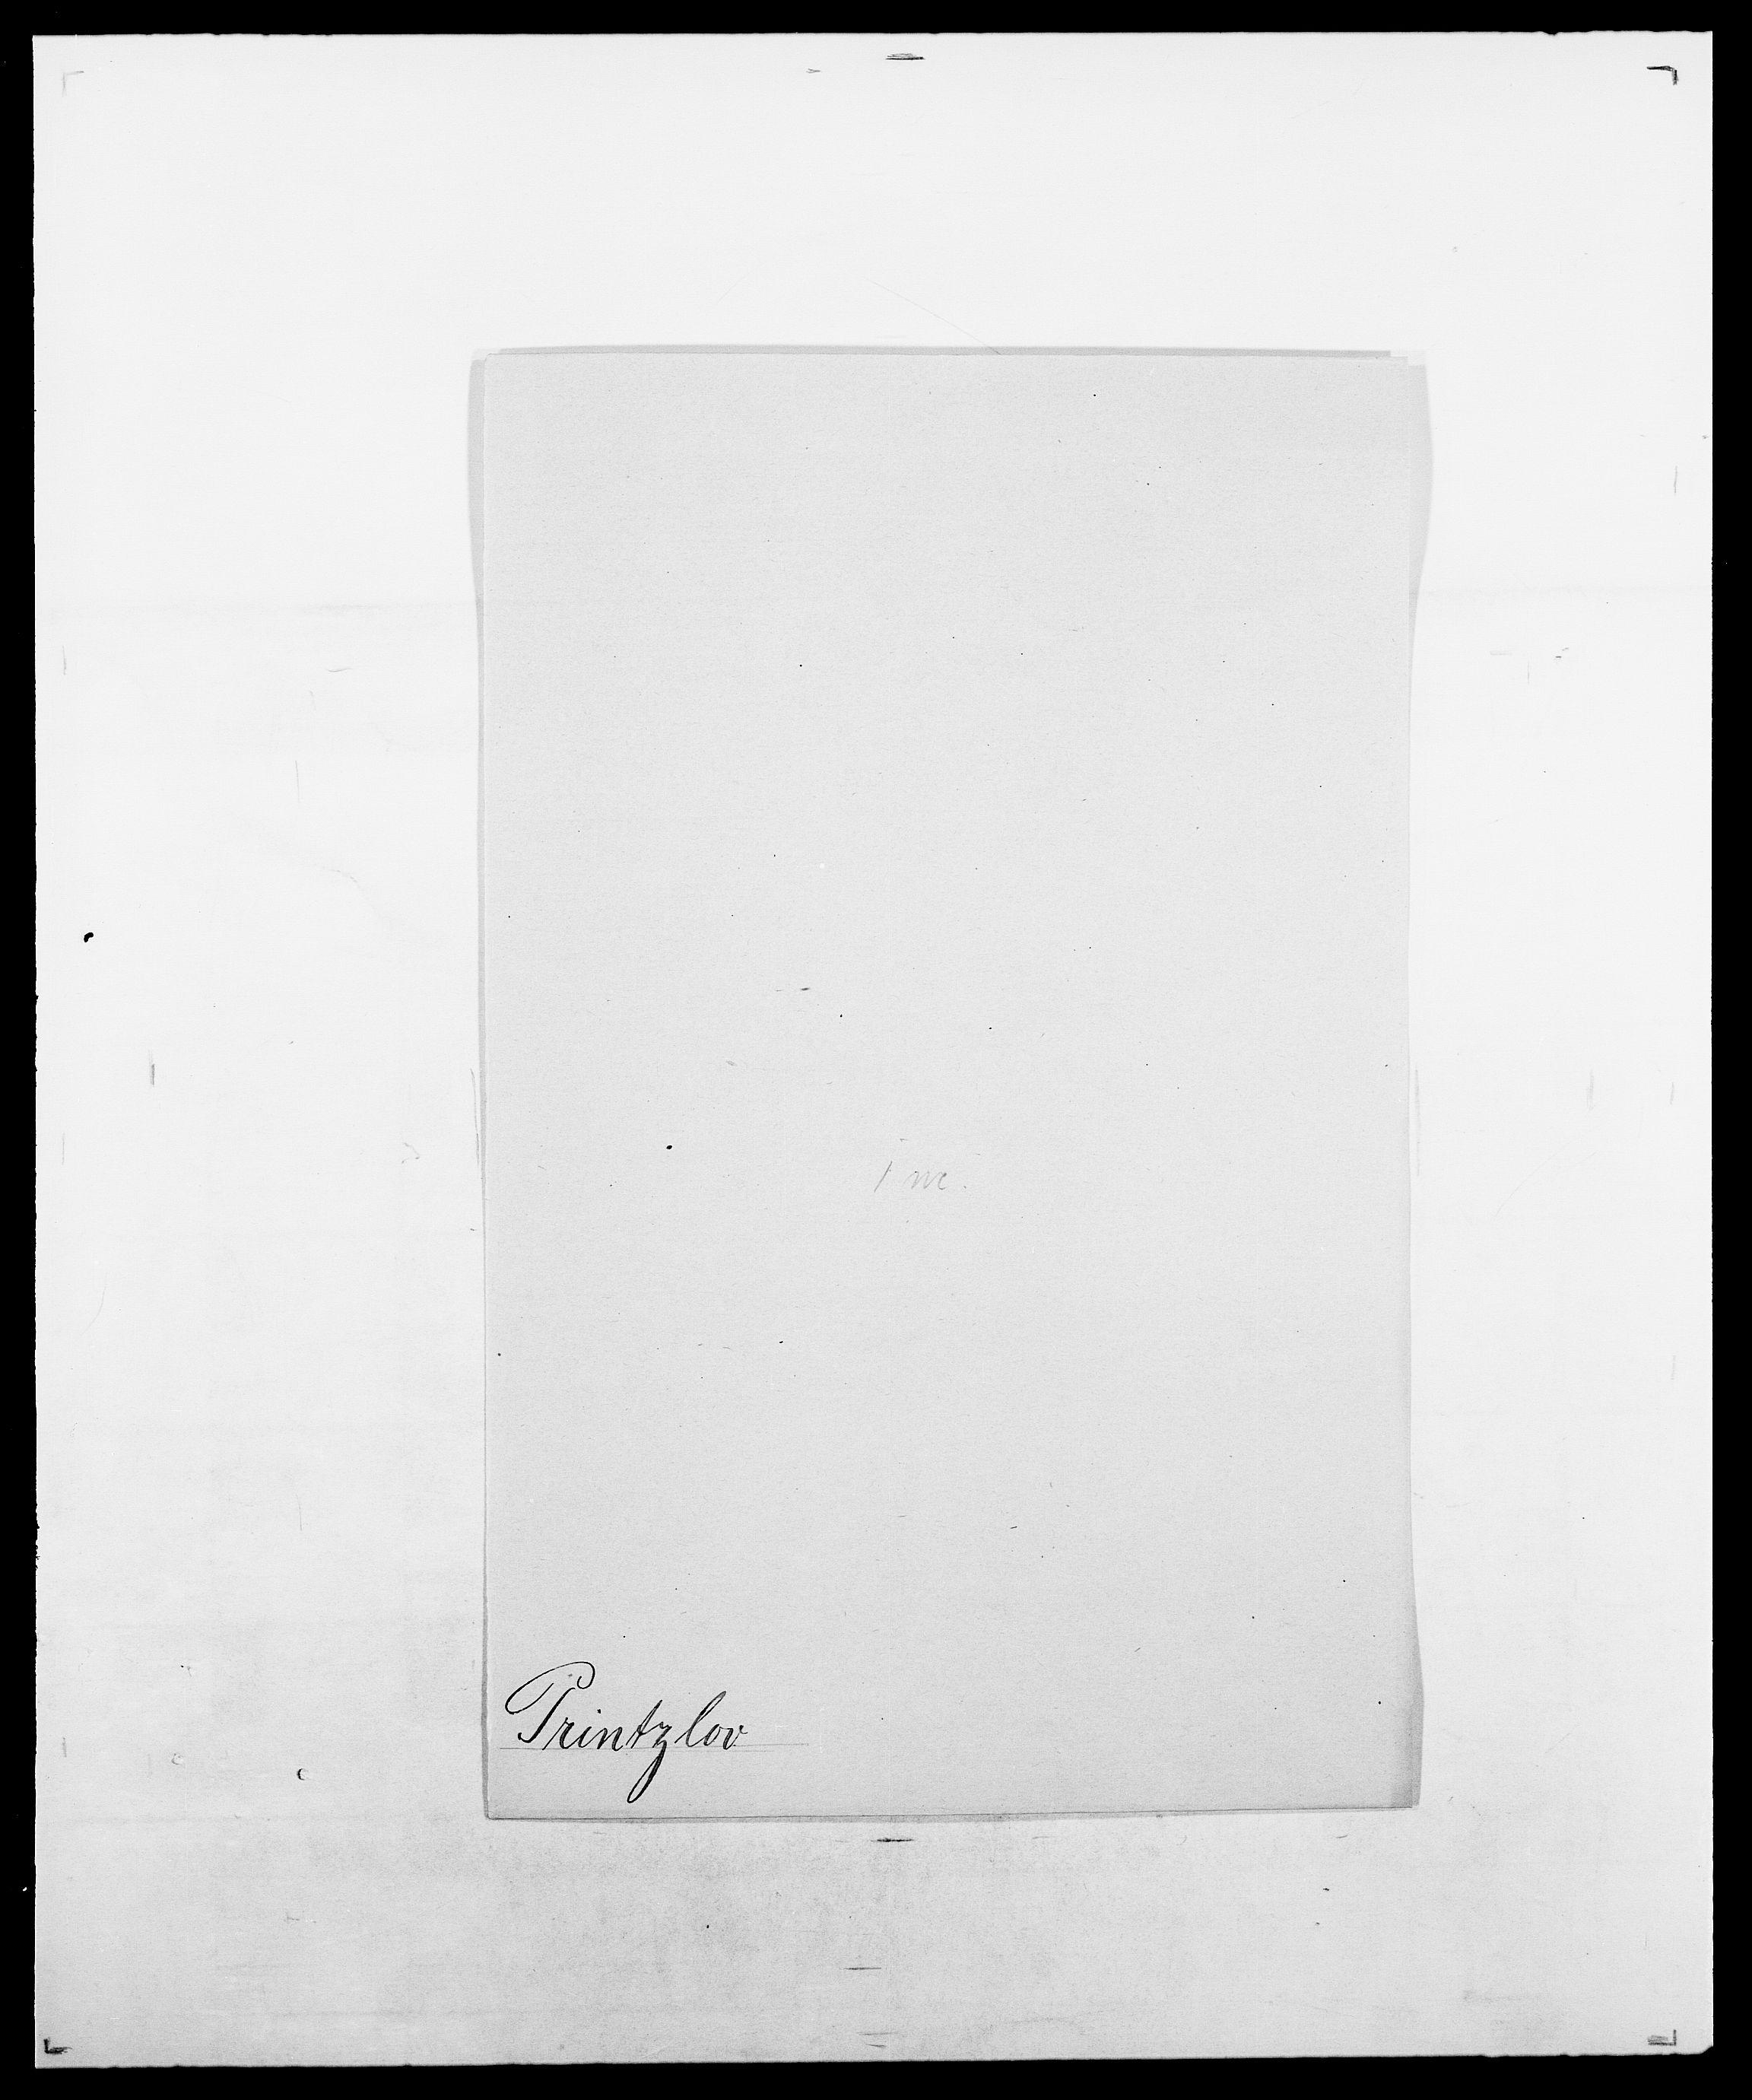 SAO, Delgobe, Charles Antoine - samling, D/Da/L0031: de Place - Raaum, s. 349